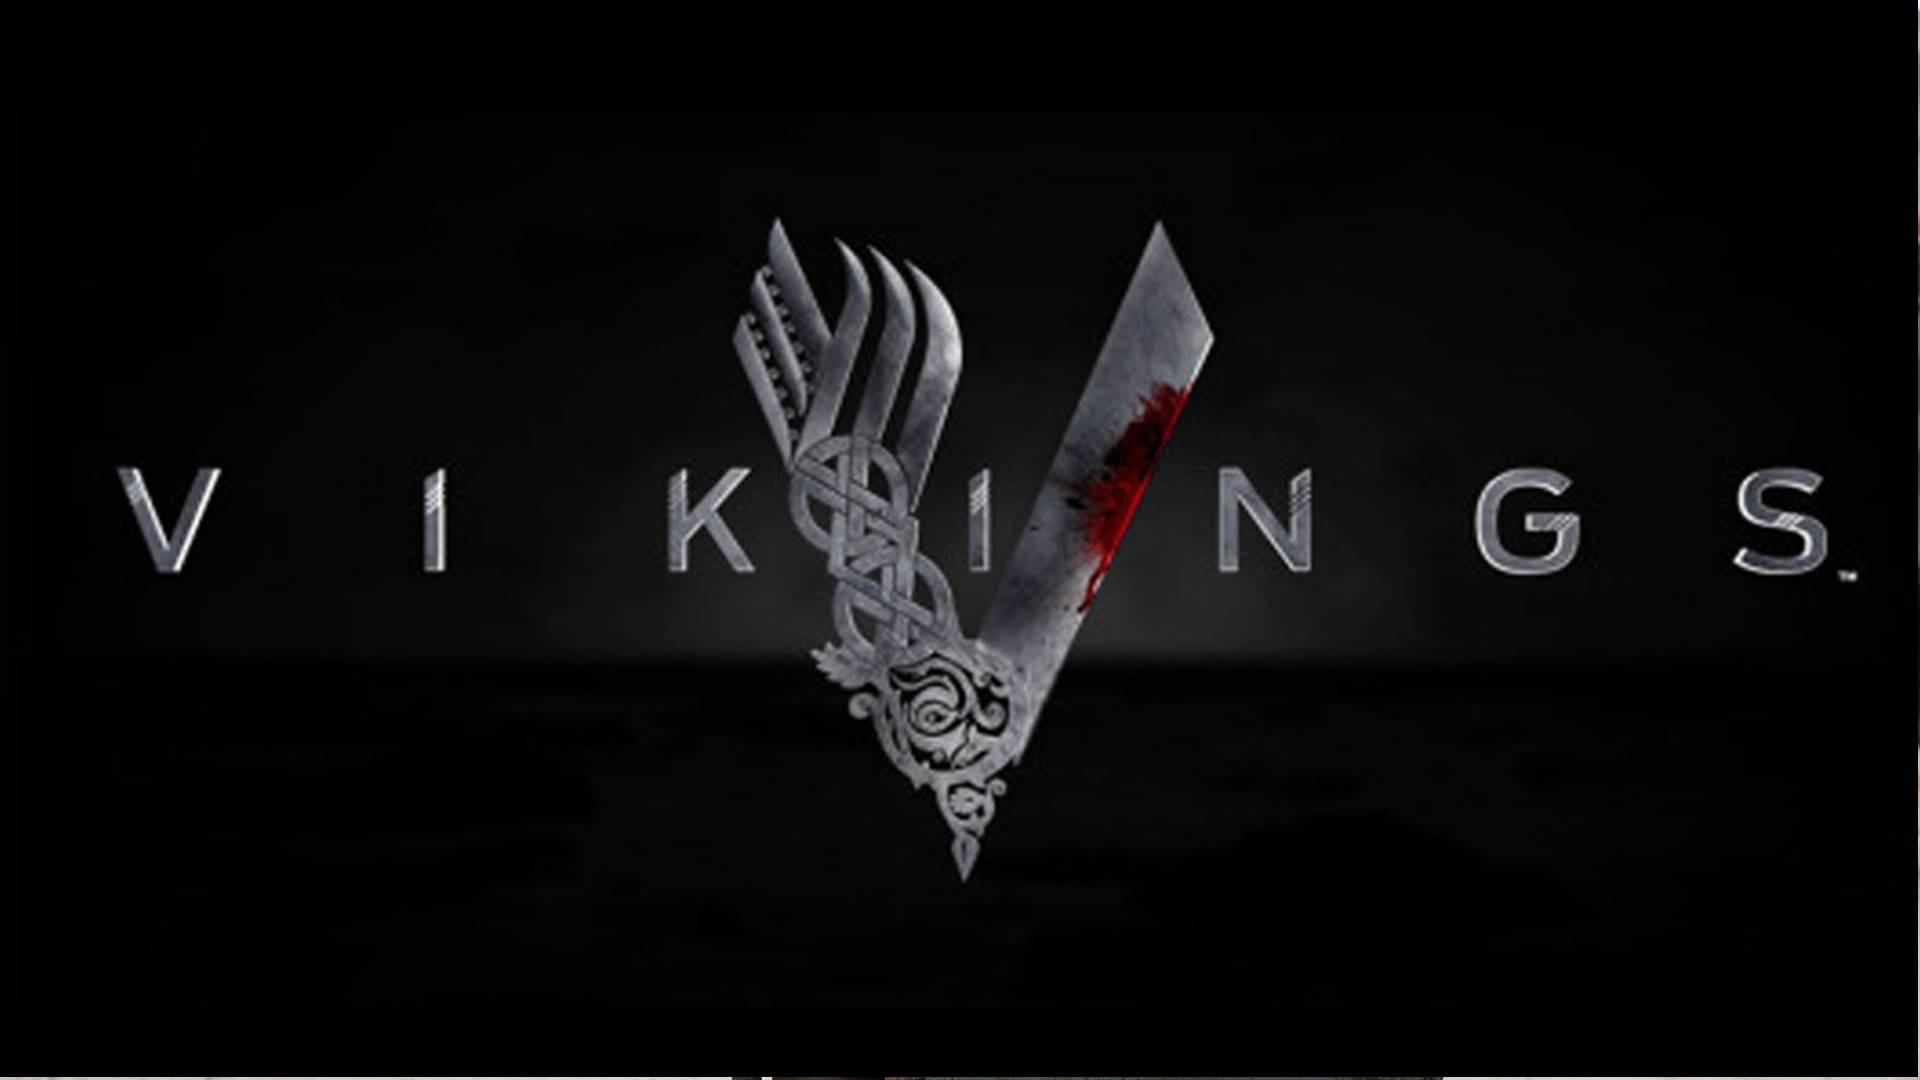 Res: 1920x1080,  Vikings Logo on Black - Vikings Wallpaper